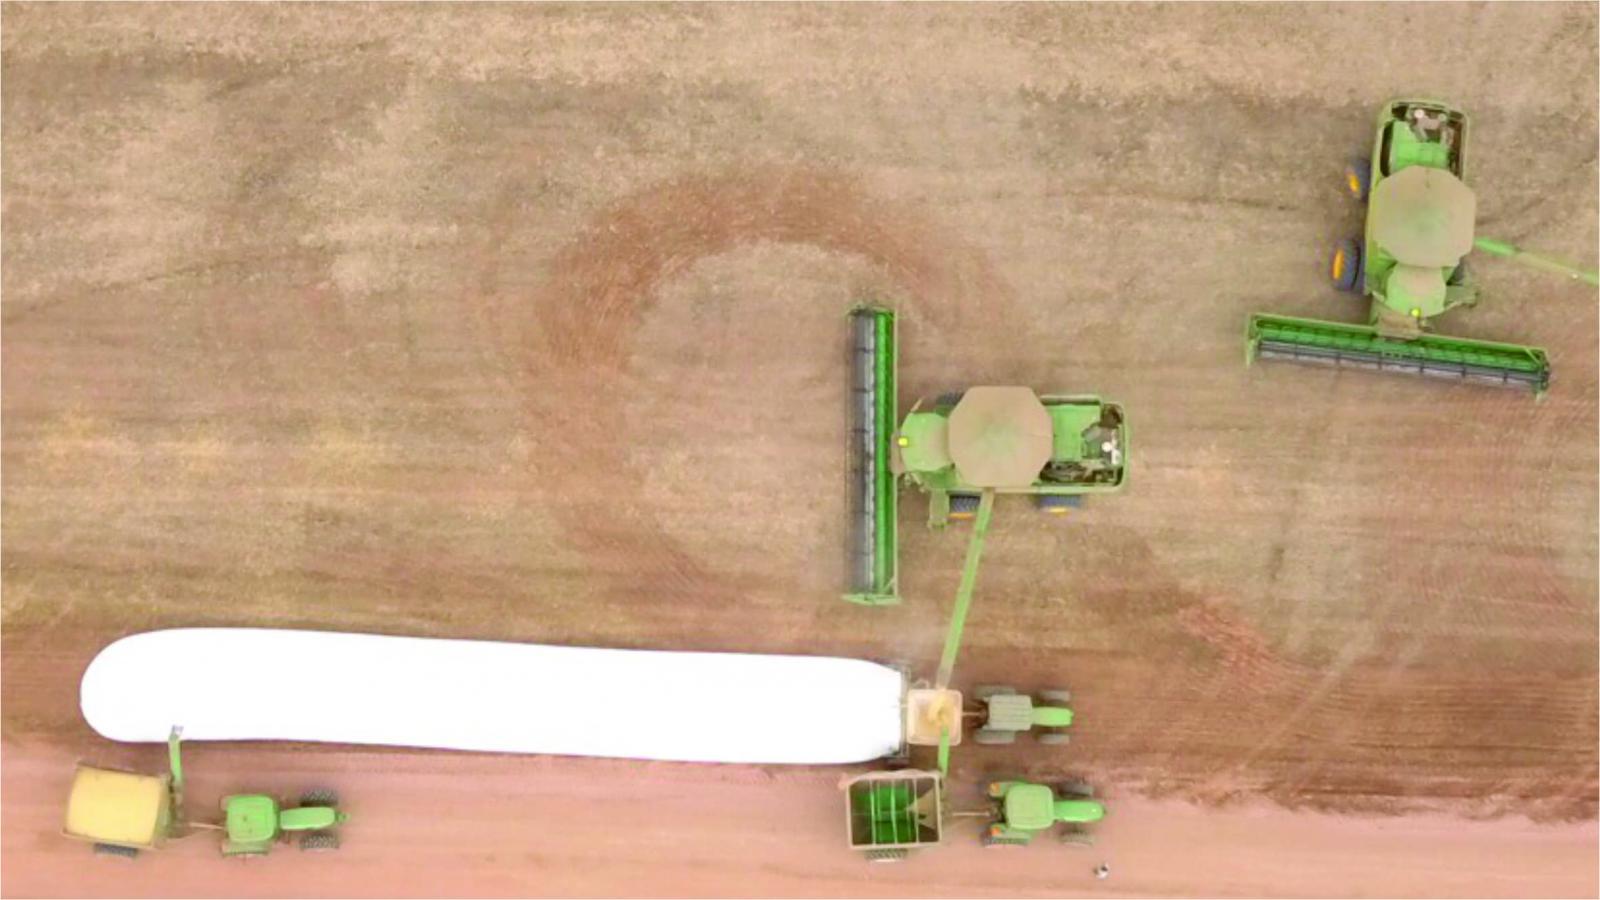 images/2018/04/carroll-farms-farmstead-45-gb1-1523485198mtuymzq4nte5oa.jpg